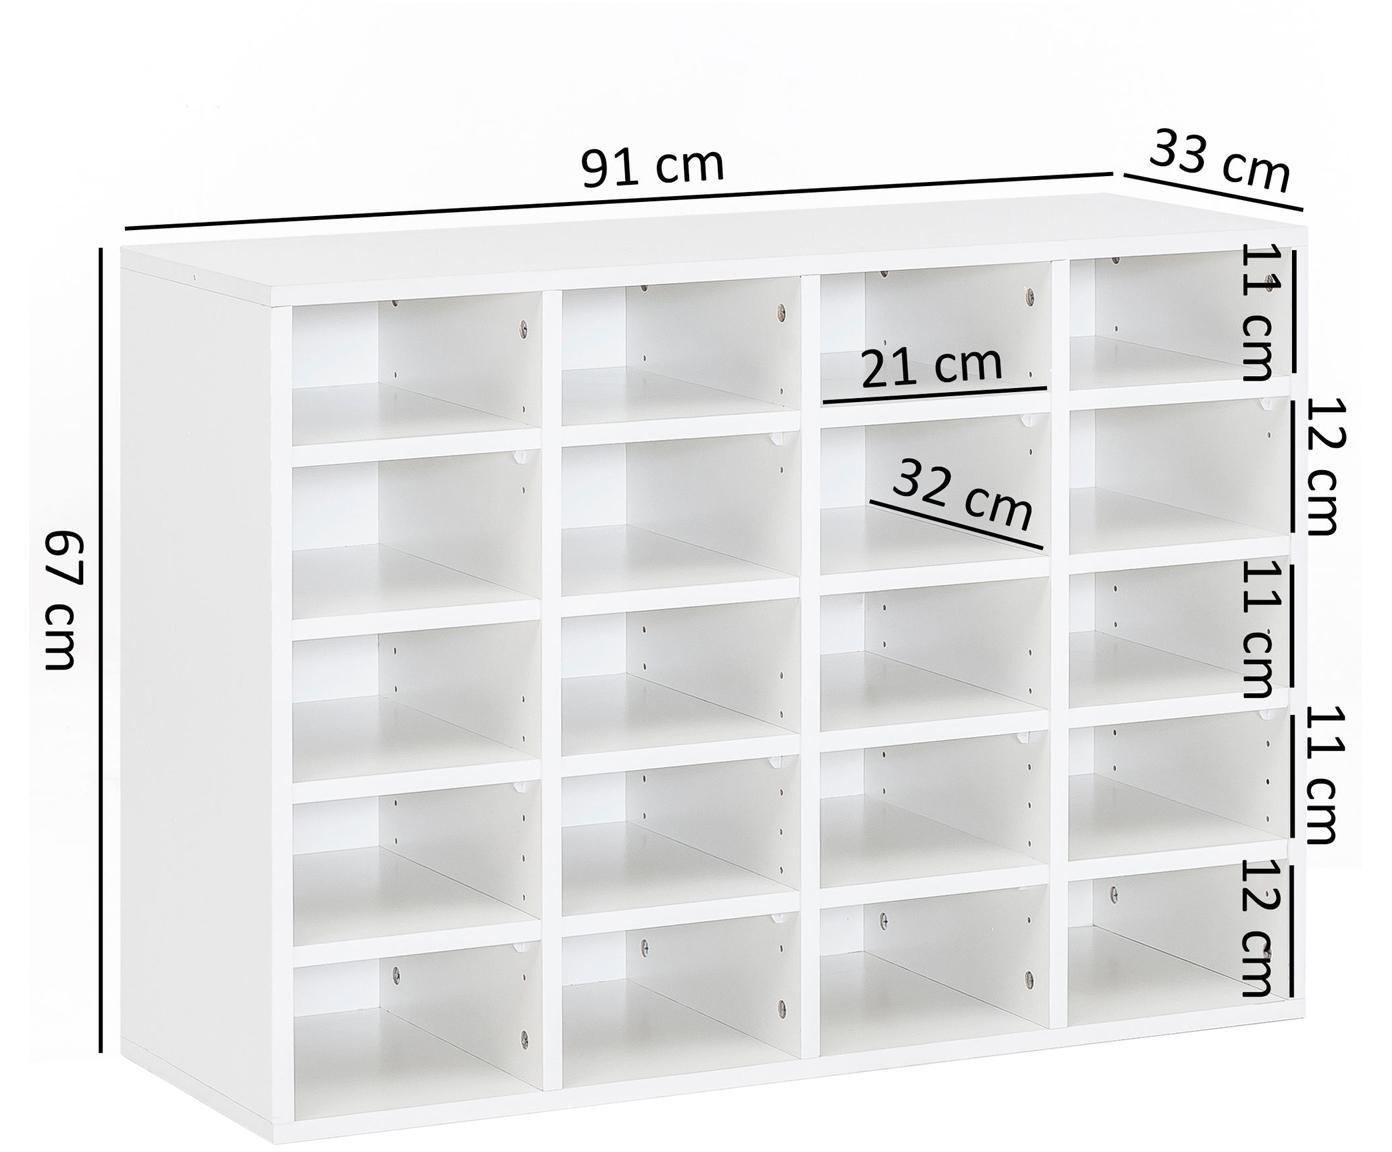 Scarpiera con 20 scomparti Diego, Truciolato, melaminico, Bianco, Larg. 91 x Alt. 67 cm